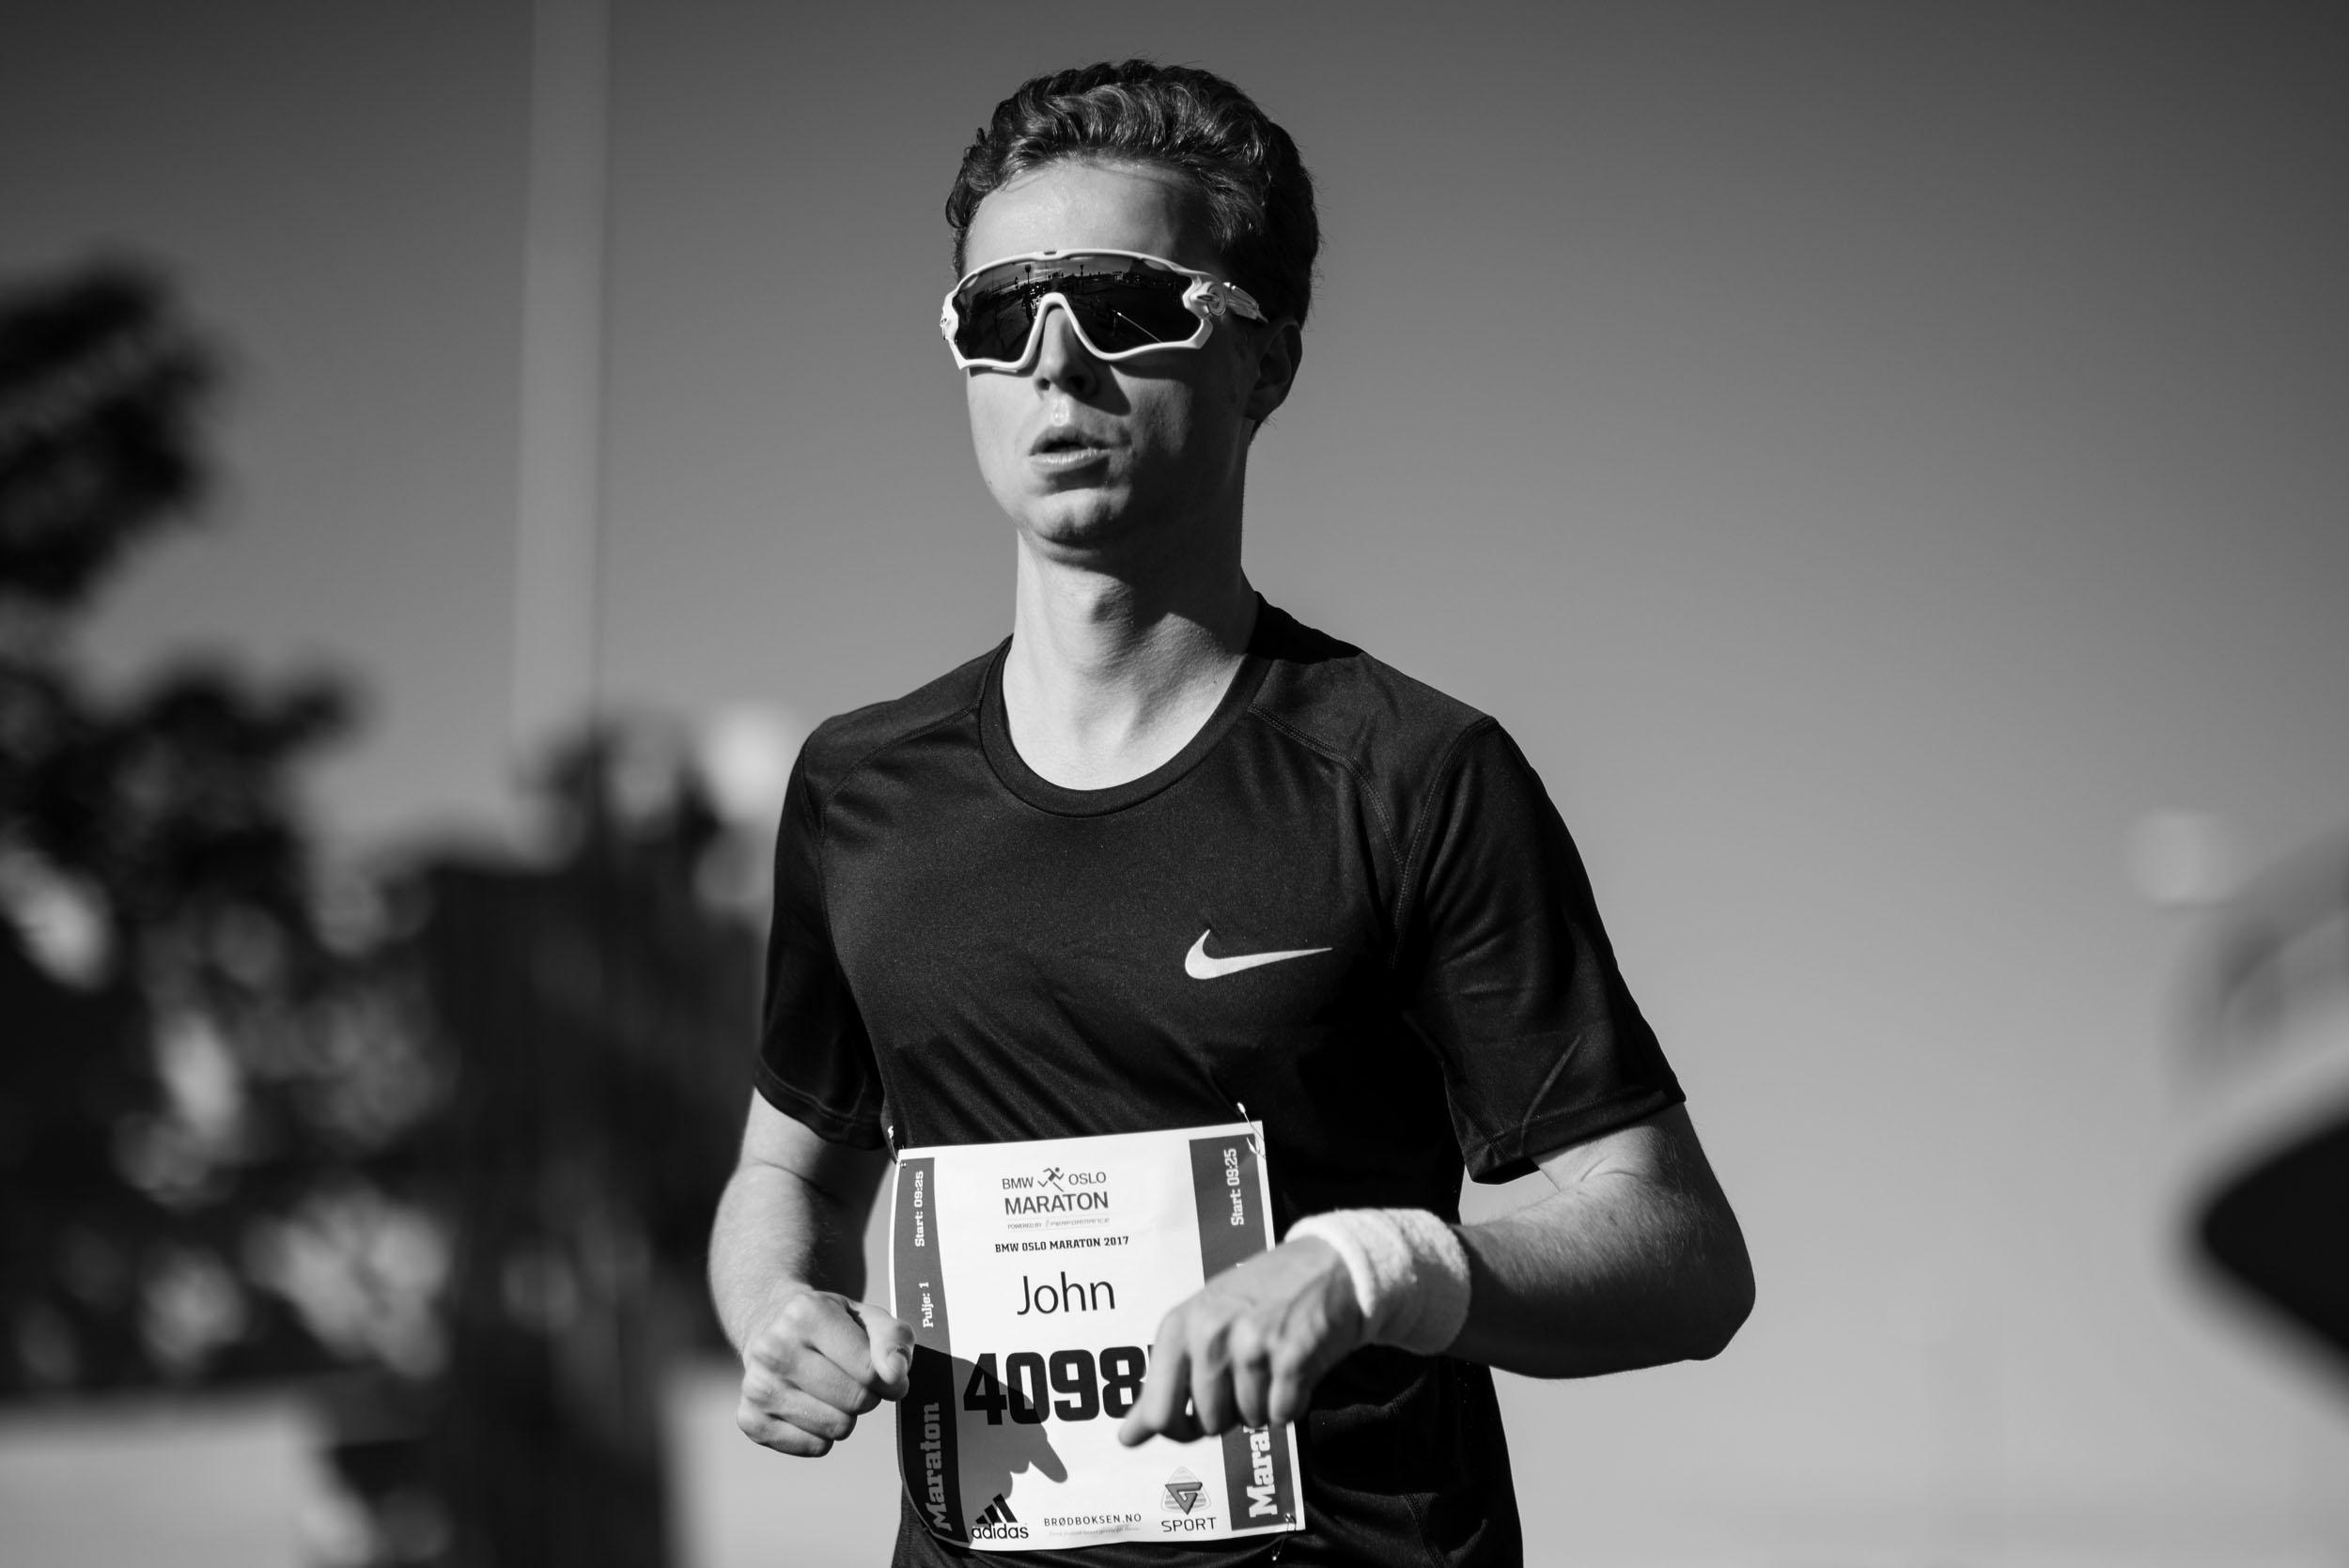 maraton02.jpg